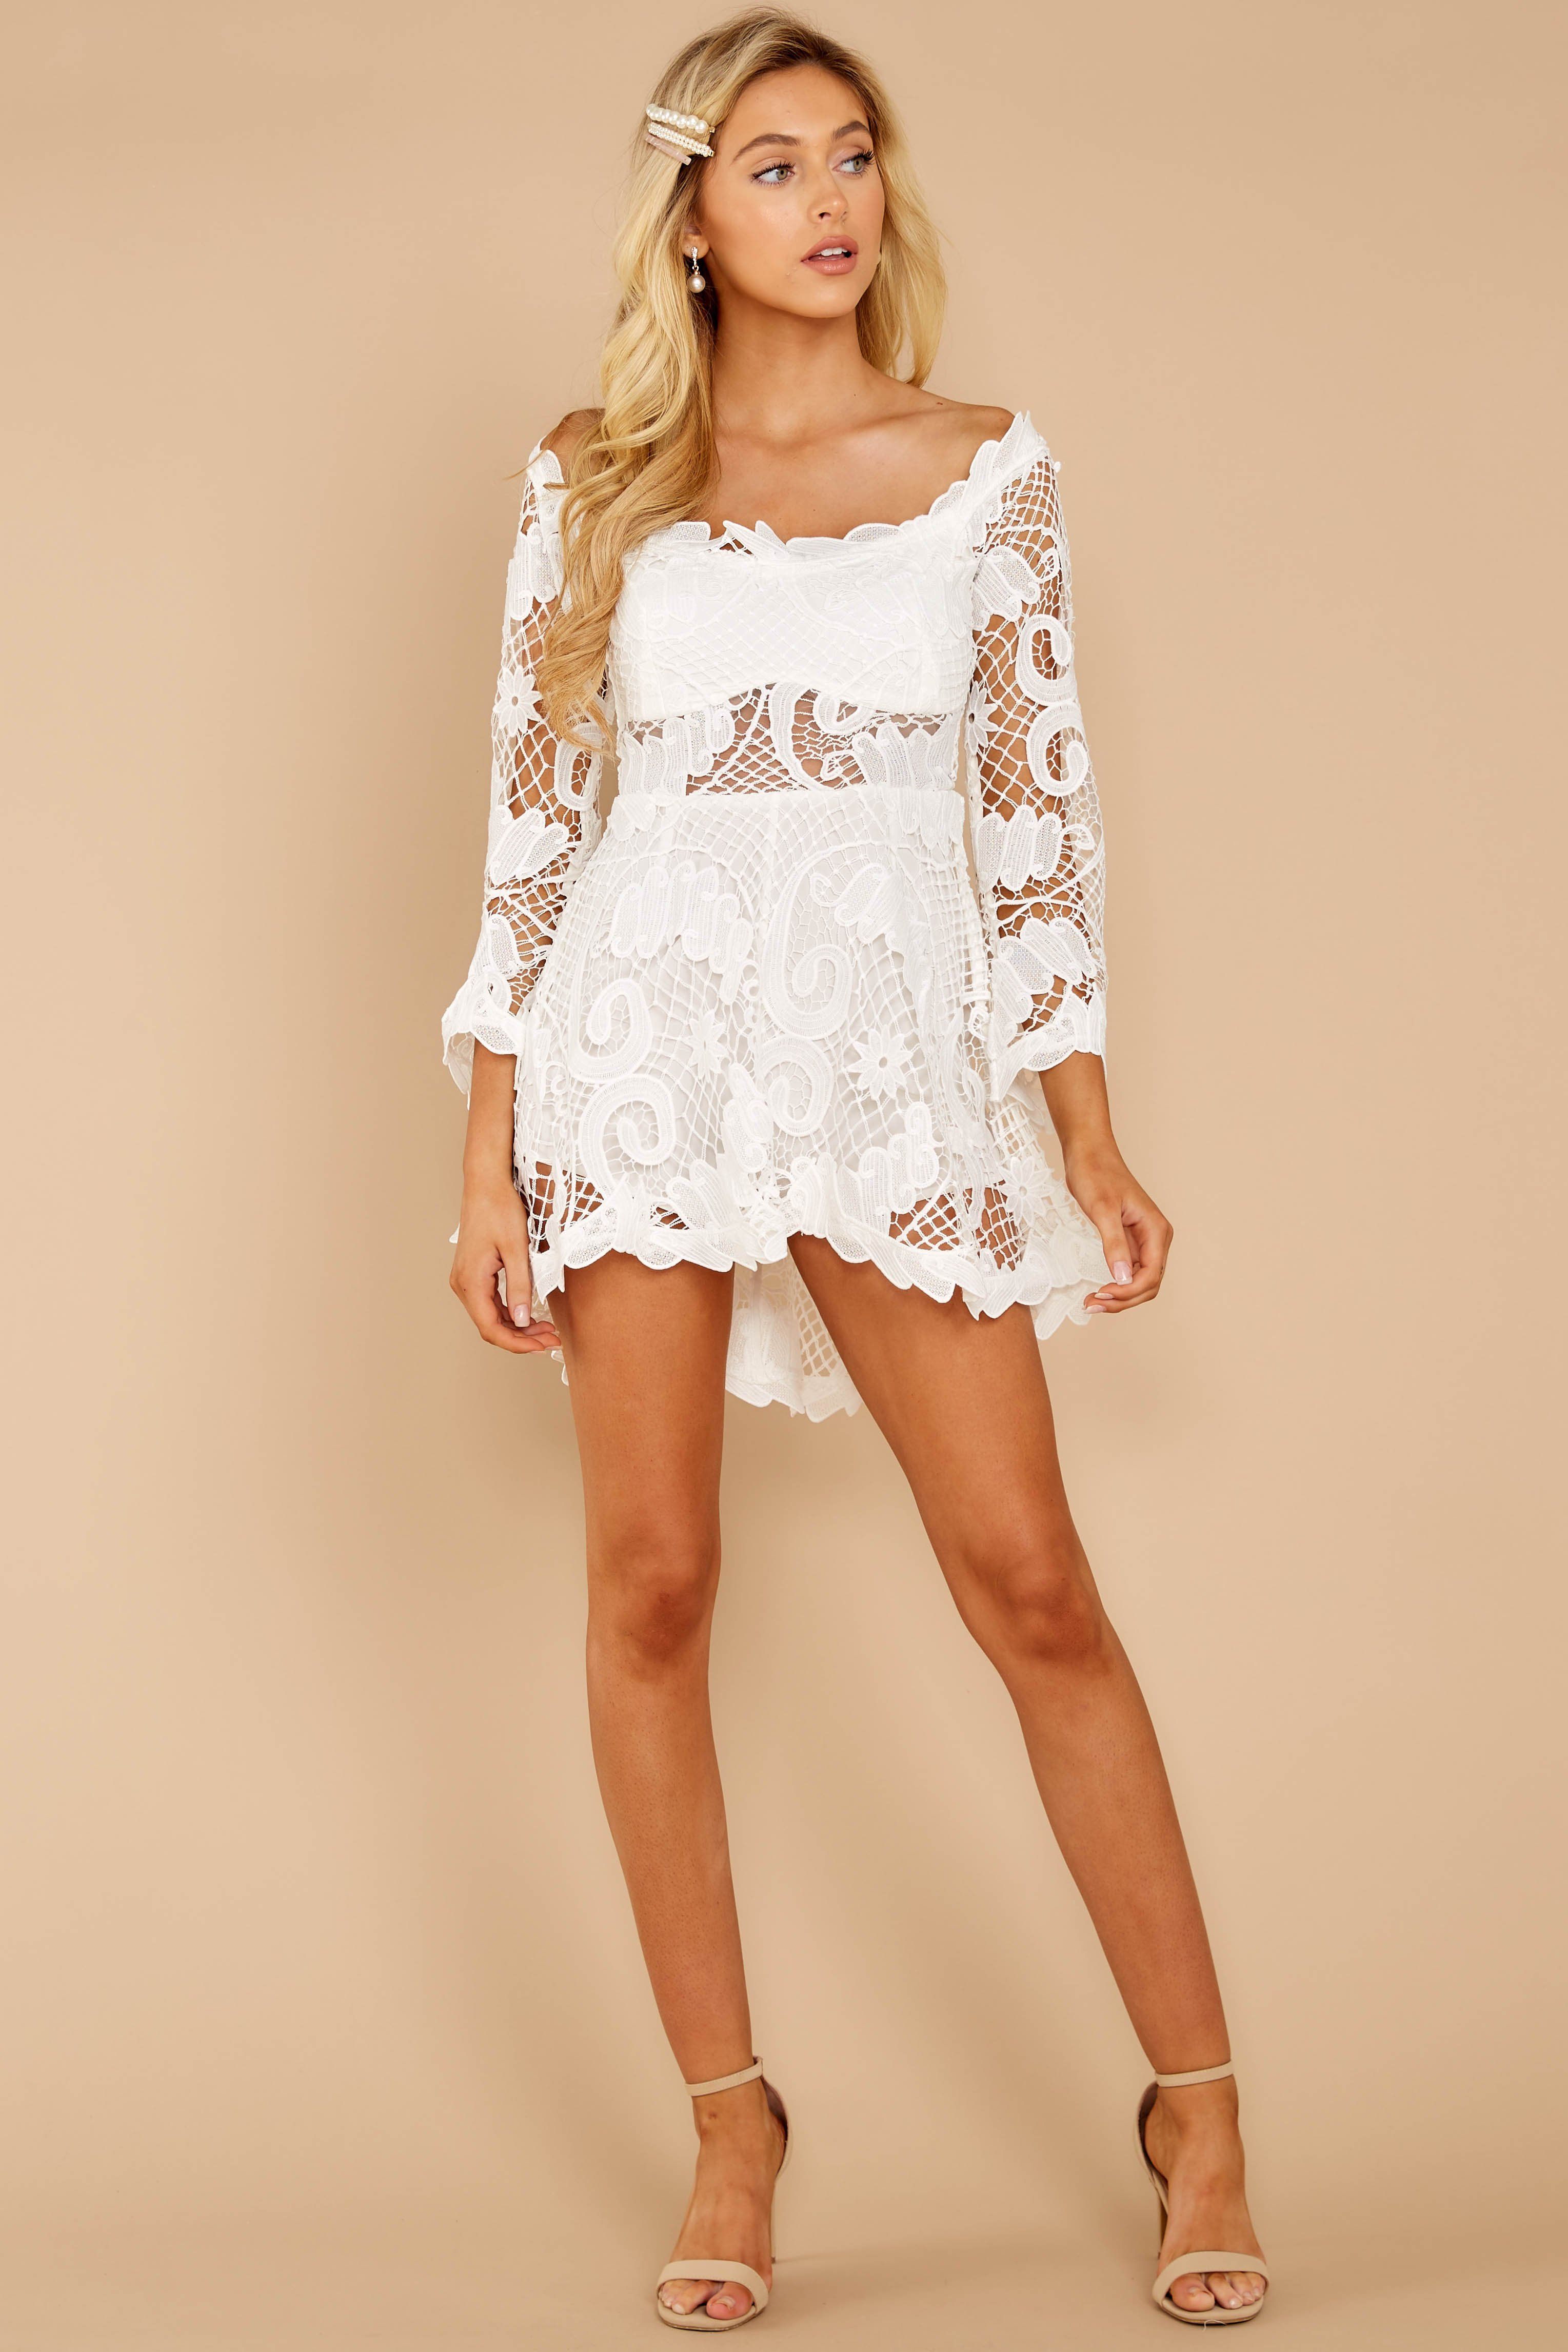 Gorgeous White Lace Dress Long Sleeve Romper Dress Dress 70 Red Dress White Lace Romper Lace Romper Lace White Dress [ 4585 x 3057 Pixel ]